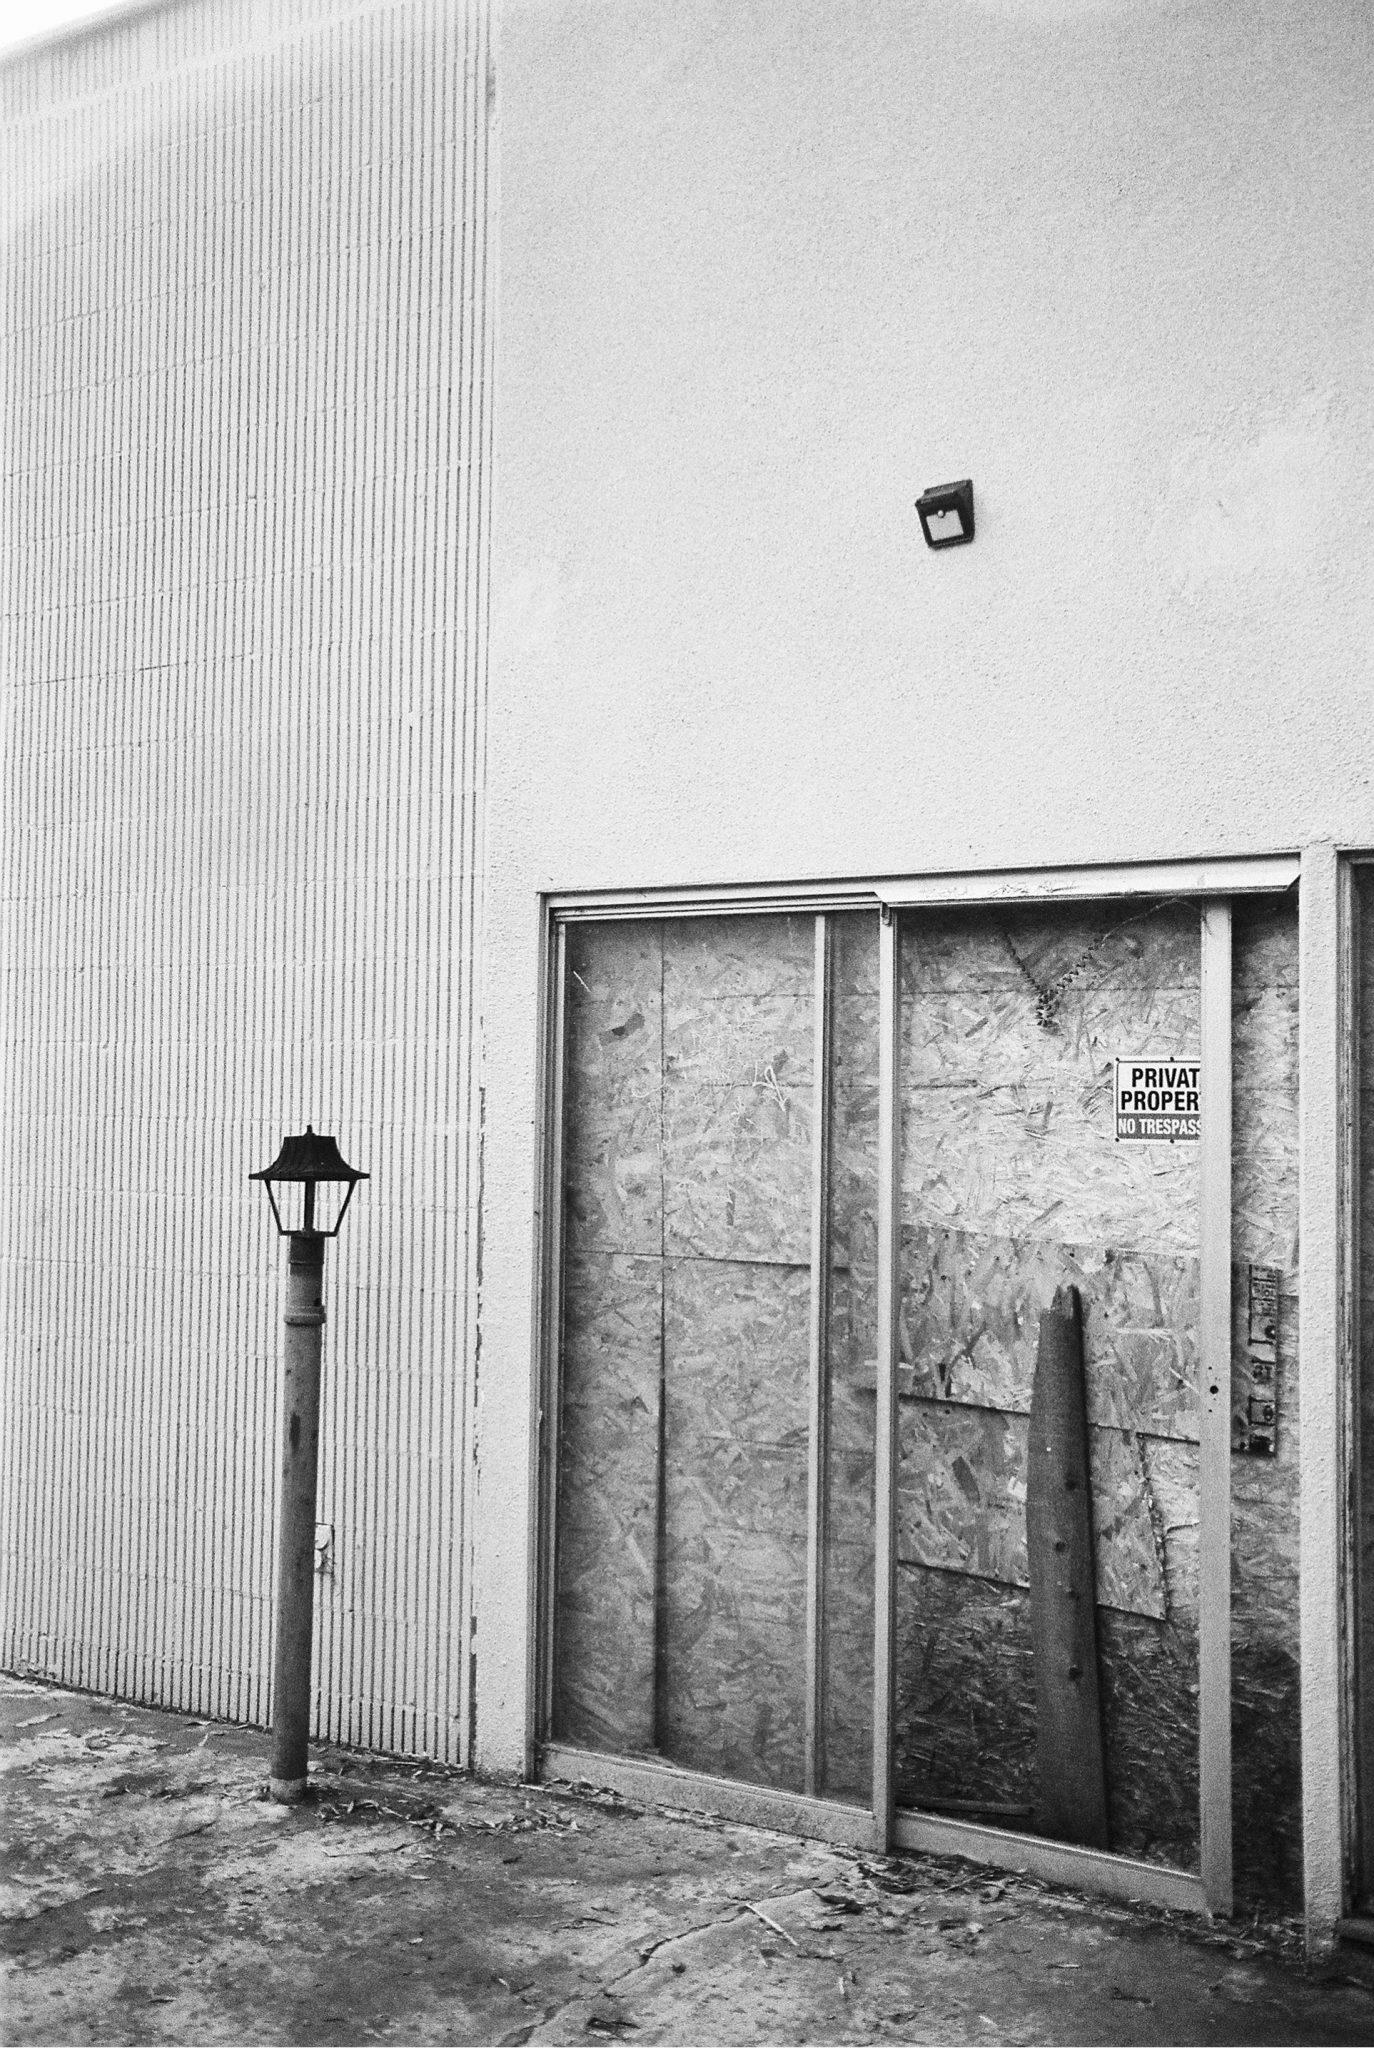 Distanced by Artemisia Polina Grasso